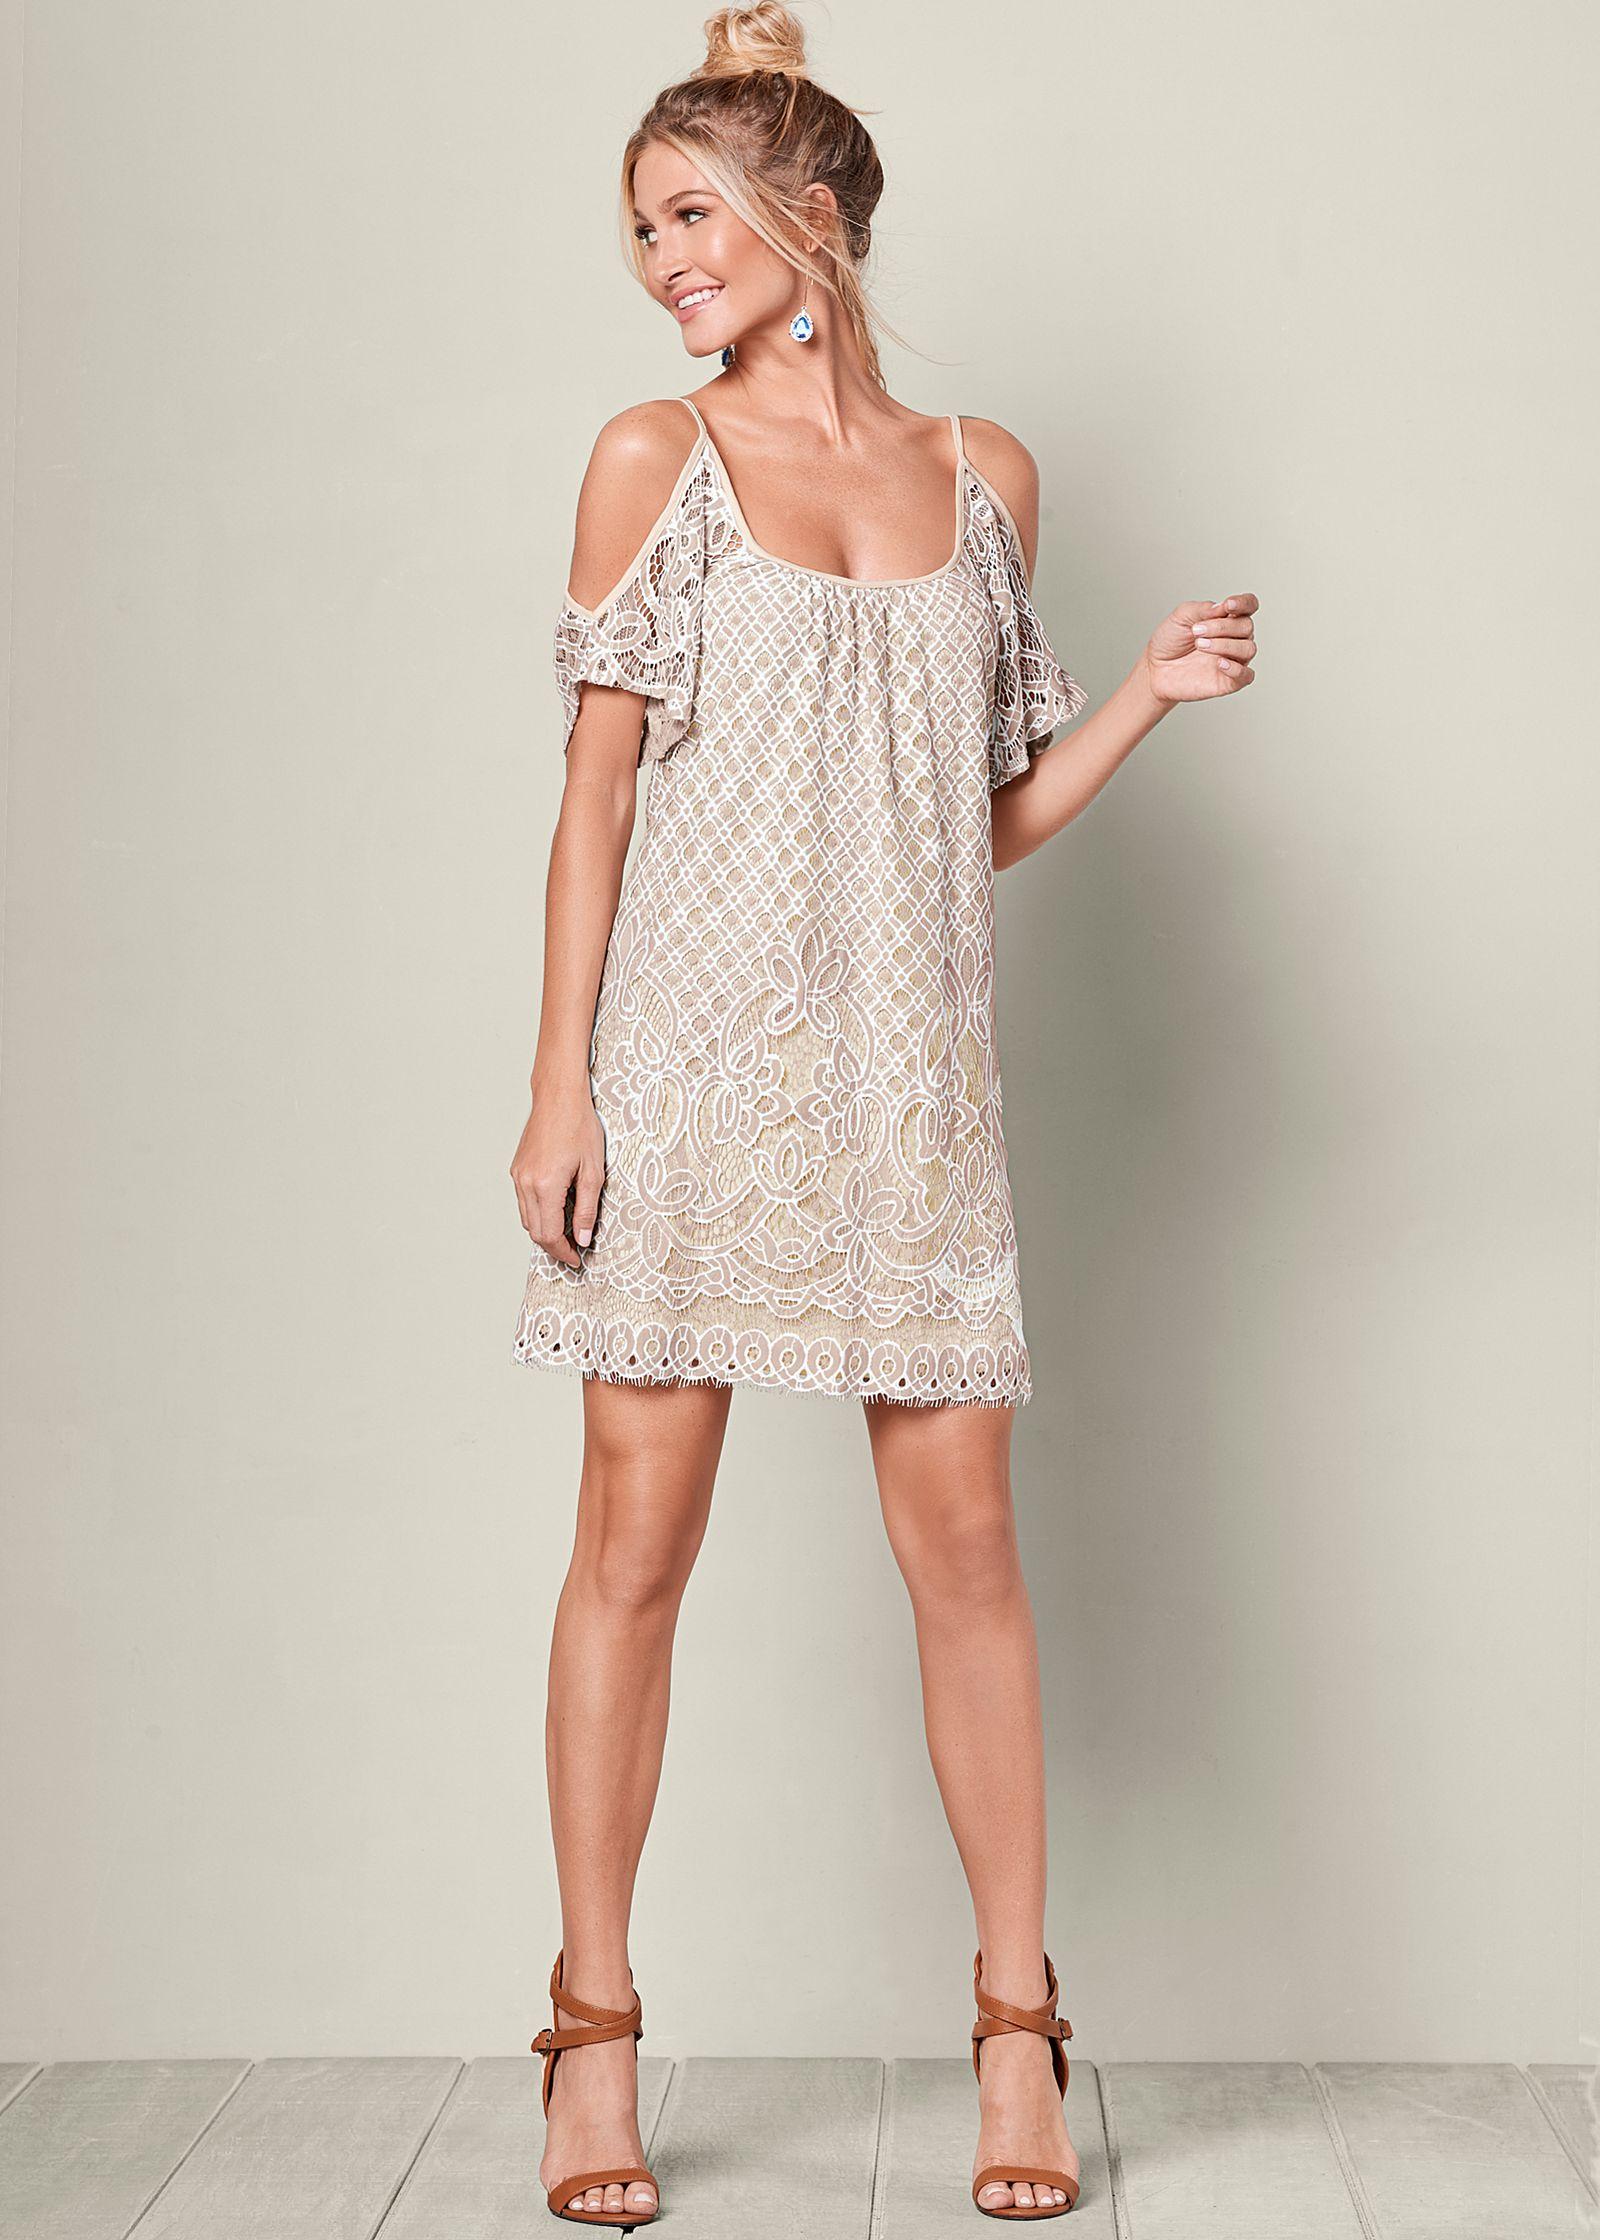 COLD SHOULDER LACE DRESS in Ivory Multi   VENUS